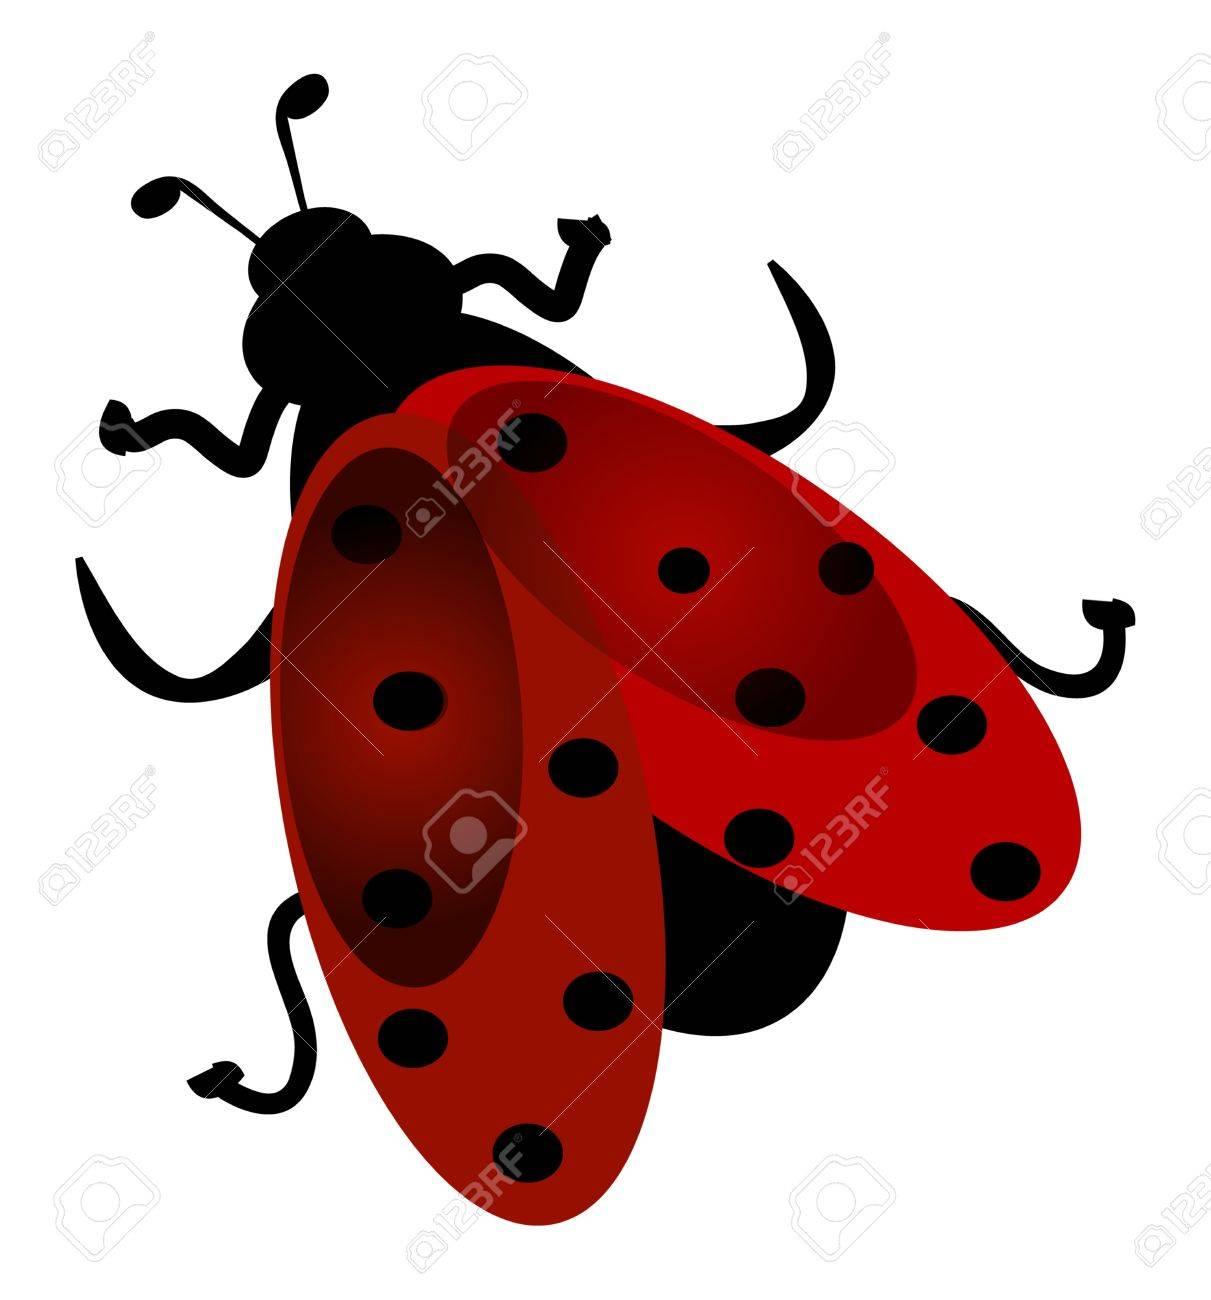 Cute ladybug flying. Cartoon character illustration. Stock Illustration - 4548113